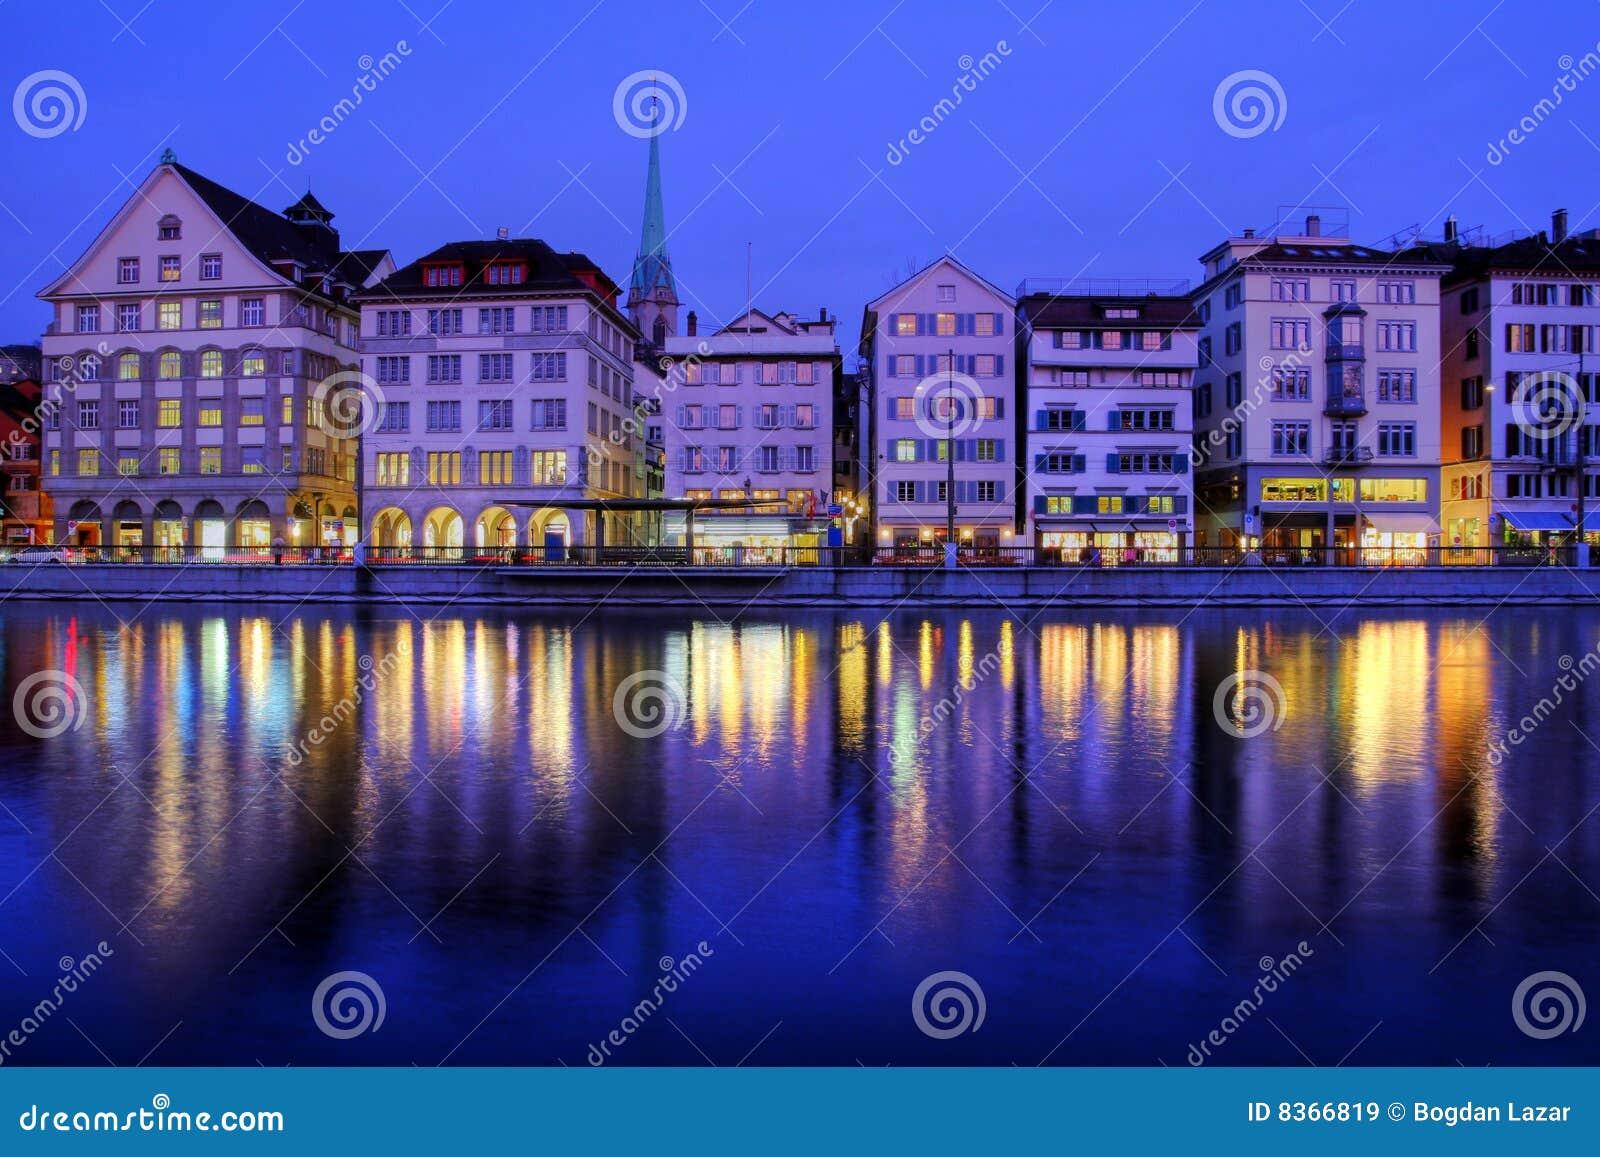 Banca Oriental De Pr:Beira-rio Na Noite, Switzerland De Zurique Imagens de Stock Royalty